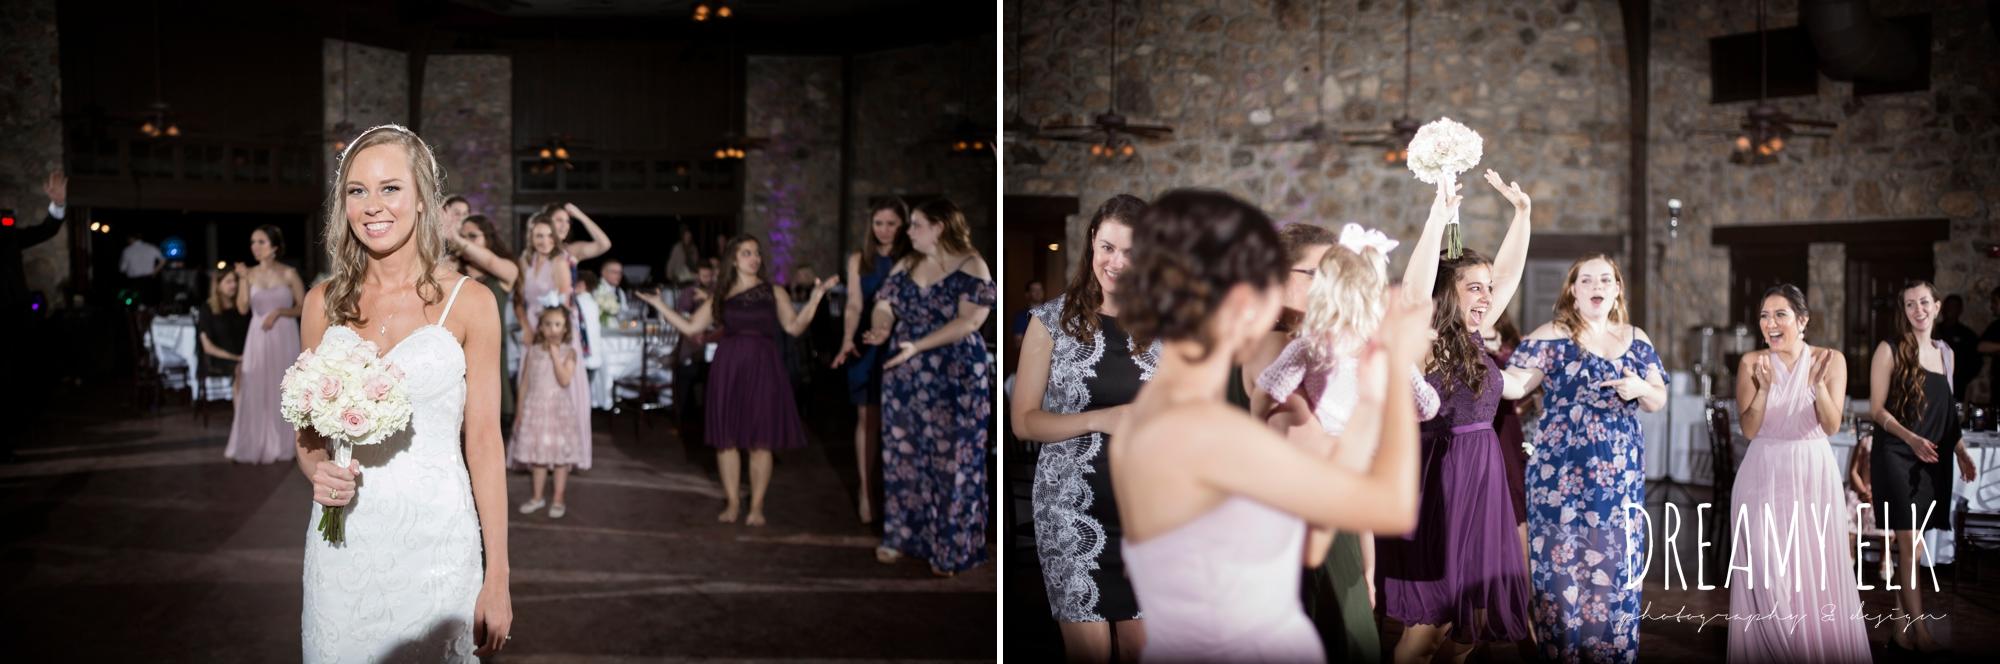 bouquet toss, cloudy march wedding photo, canyon springs golf club wedding, san antonio, texas {dreamy elk photography and design}